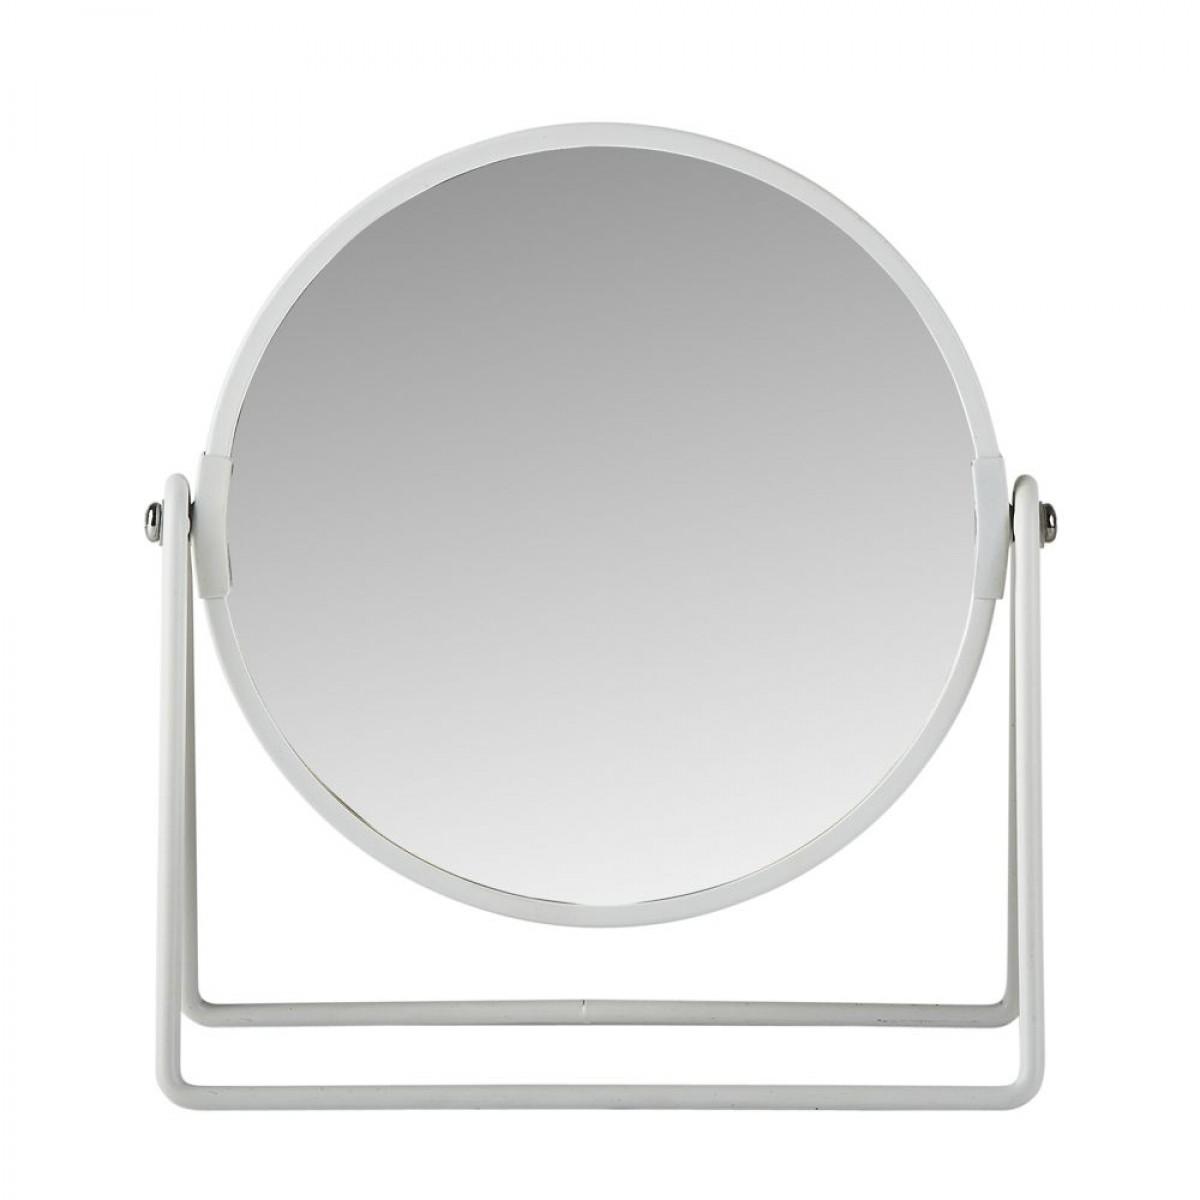 Bordspejl hvid 20 cm Ø